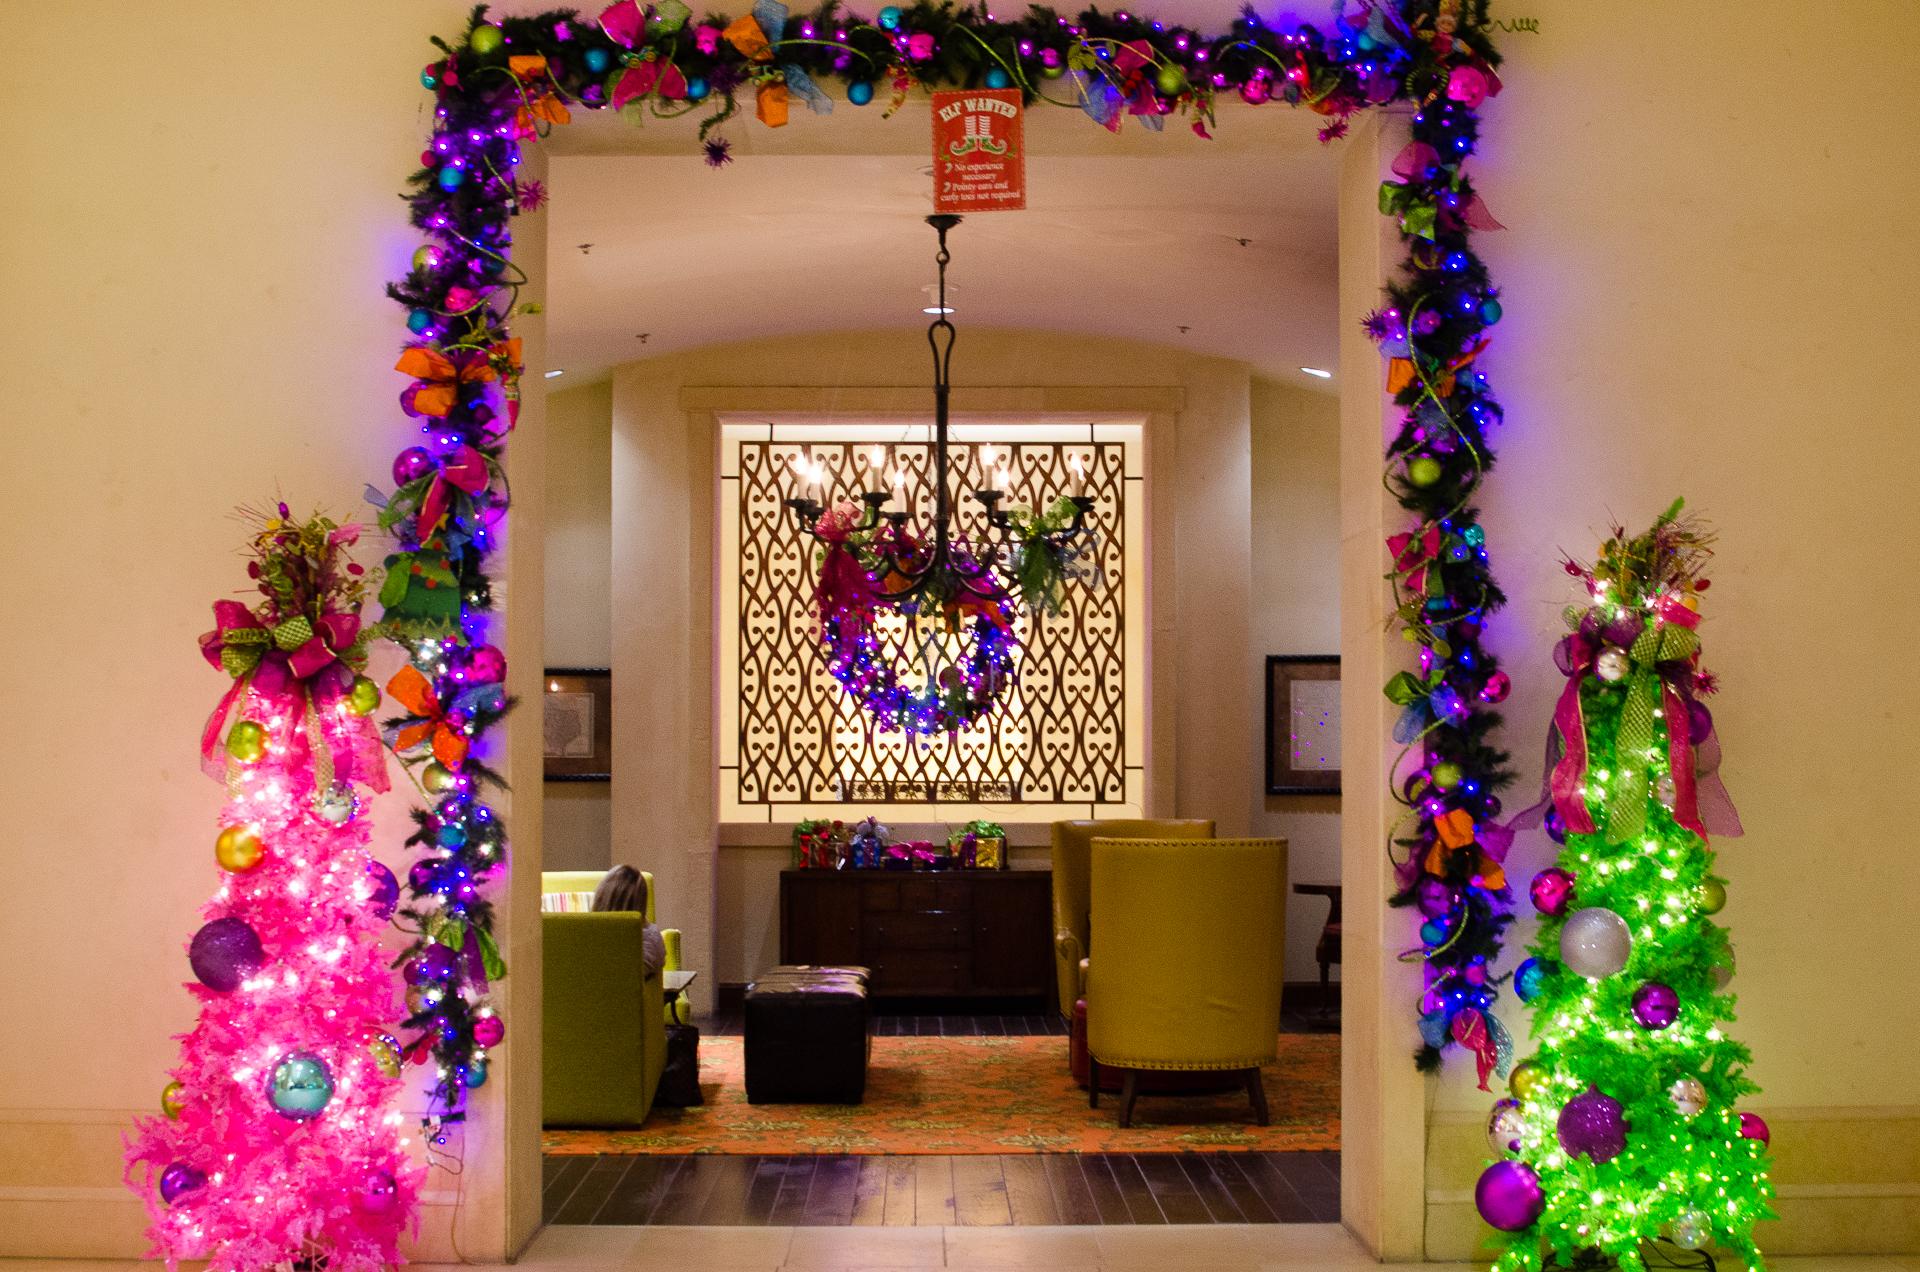 Lobby at the JW Marriott Resort, San Antonio